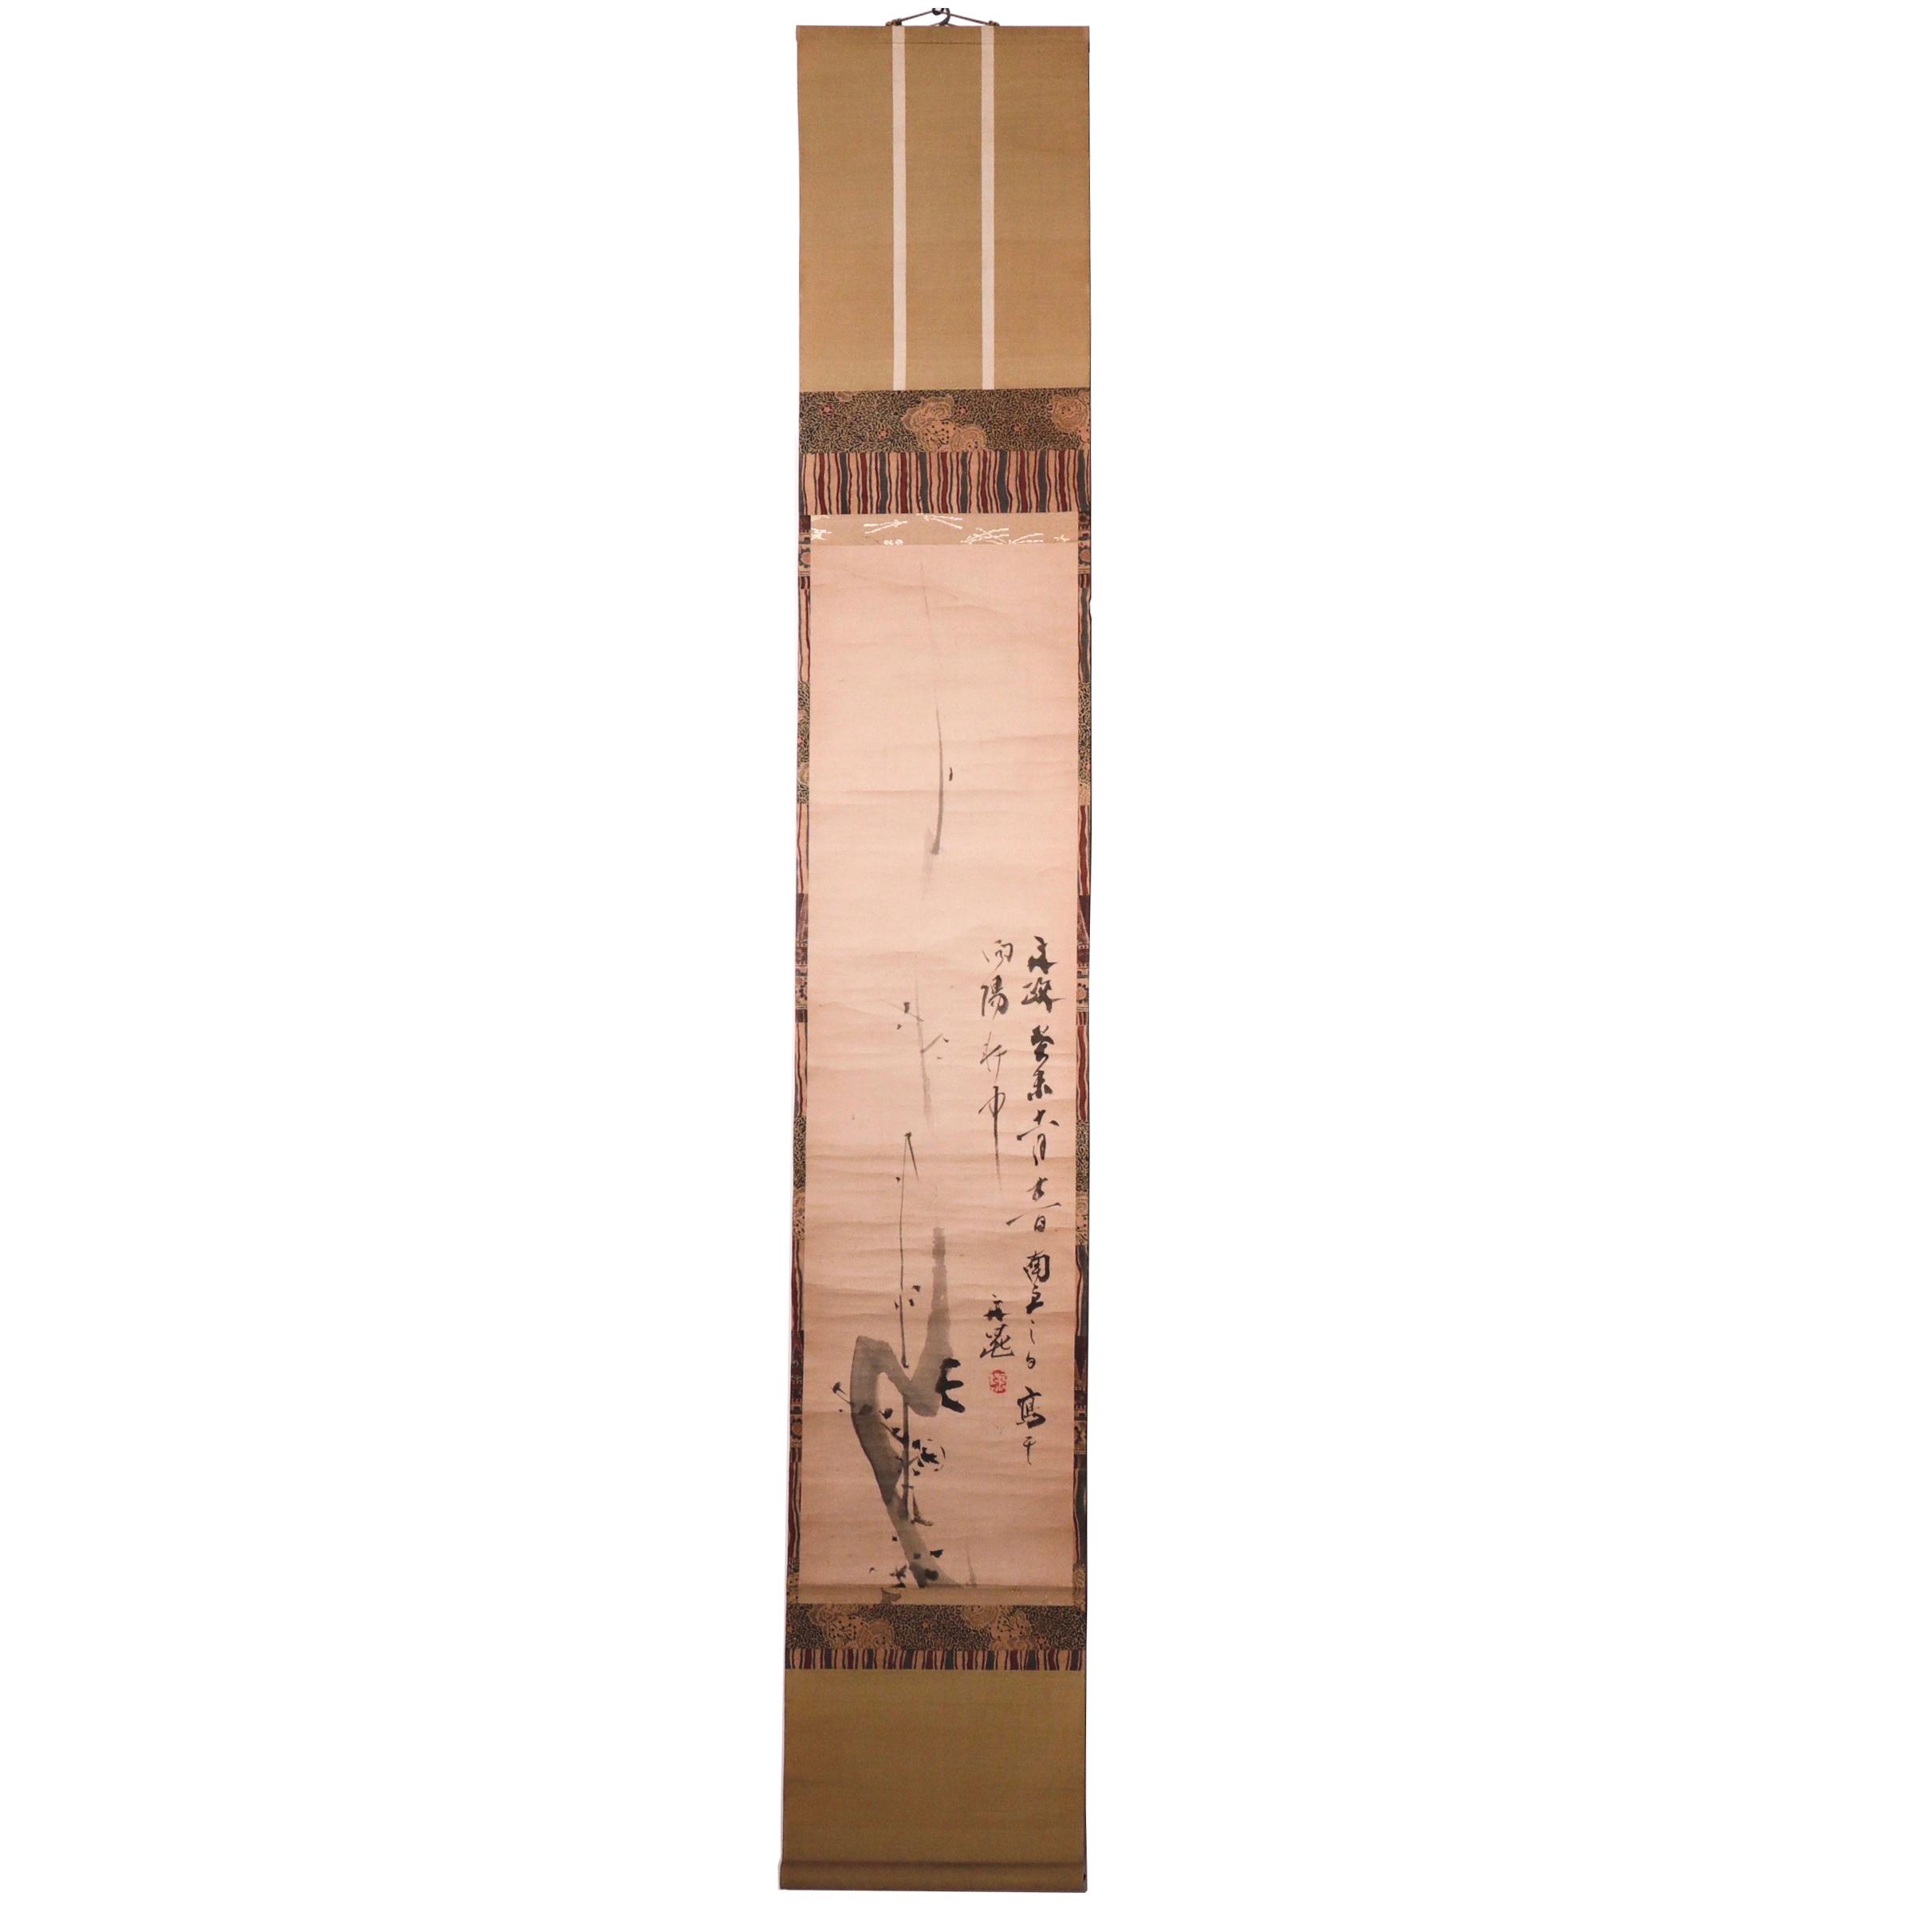 EH80001: Plum Blossoms Scroll, Tani Buncho